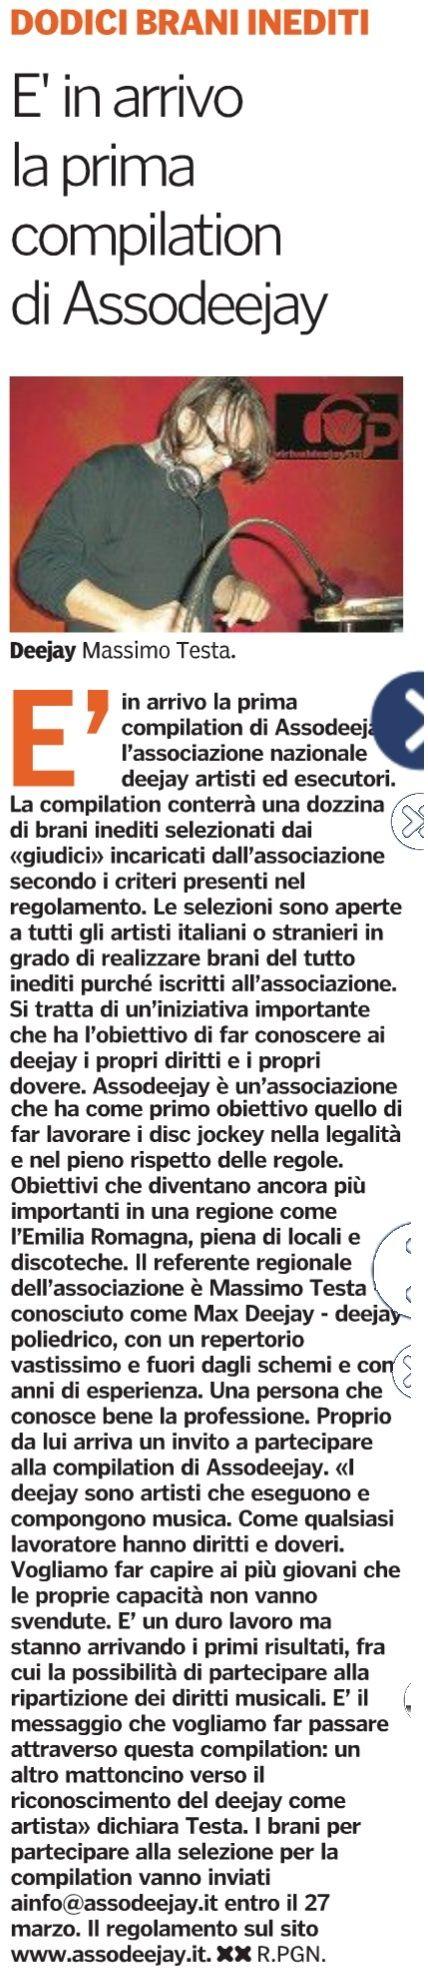 Compilation Assodeejay: Gazzetta di Parma 3 Marzo 2016 Gazzet10